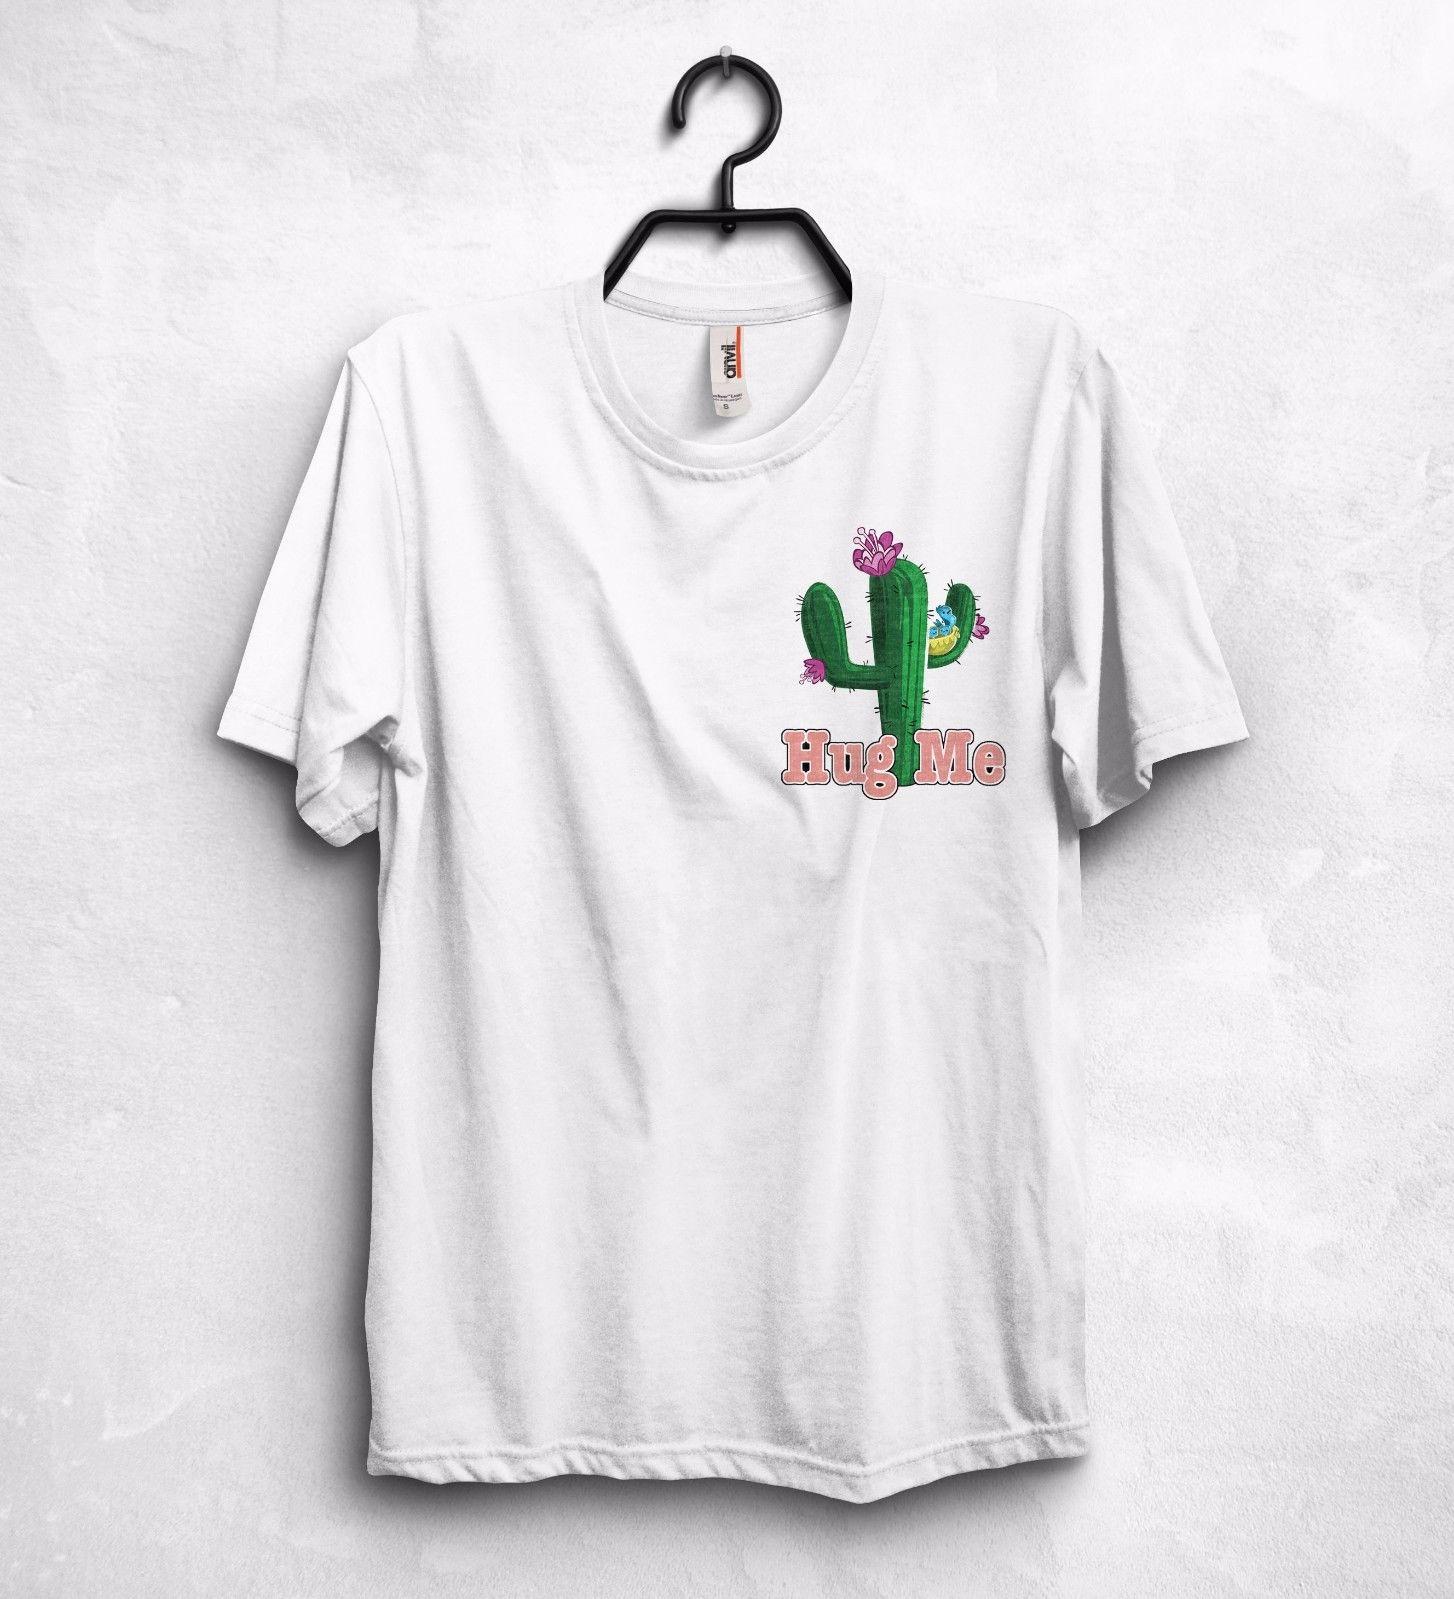 Shirt design china - Hug Me Cactus Corporation T Shirt Top Cool Sweet Logo Gift Love Design Funny Printing Casual